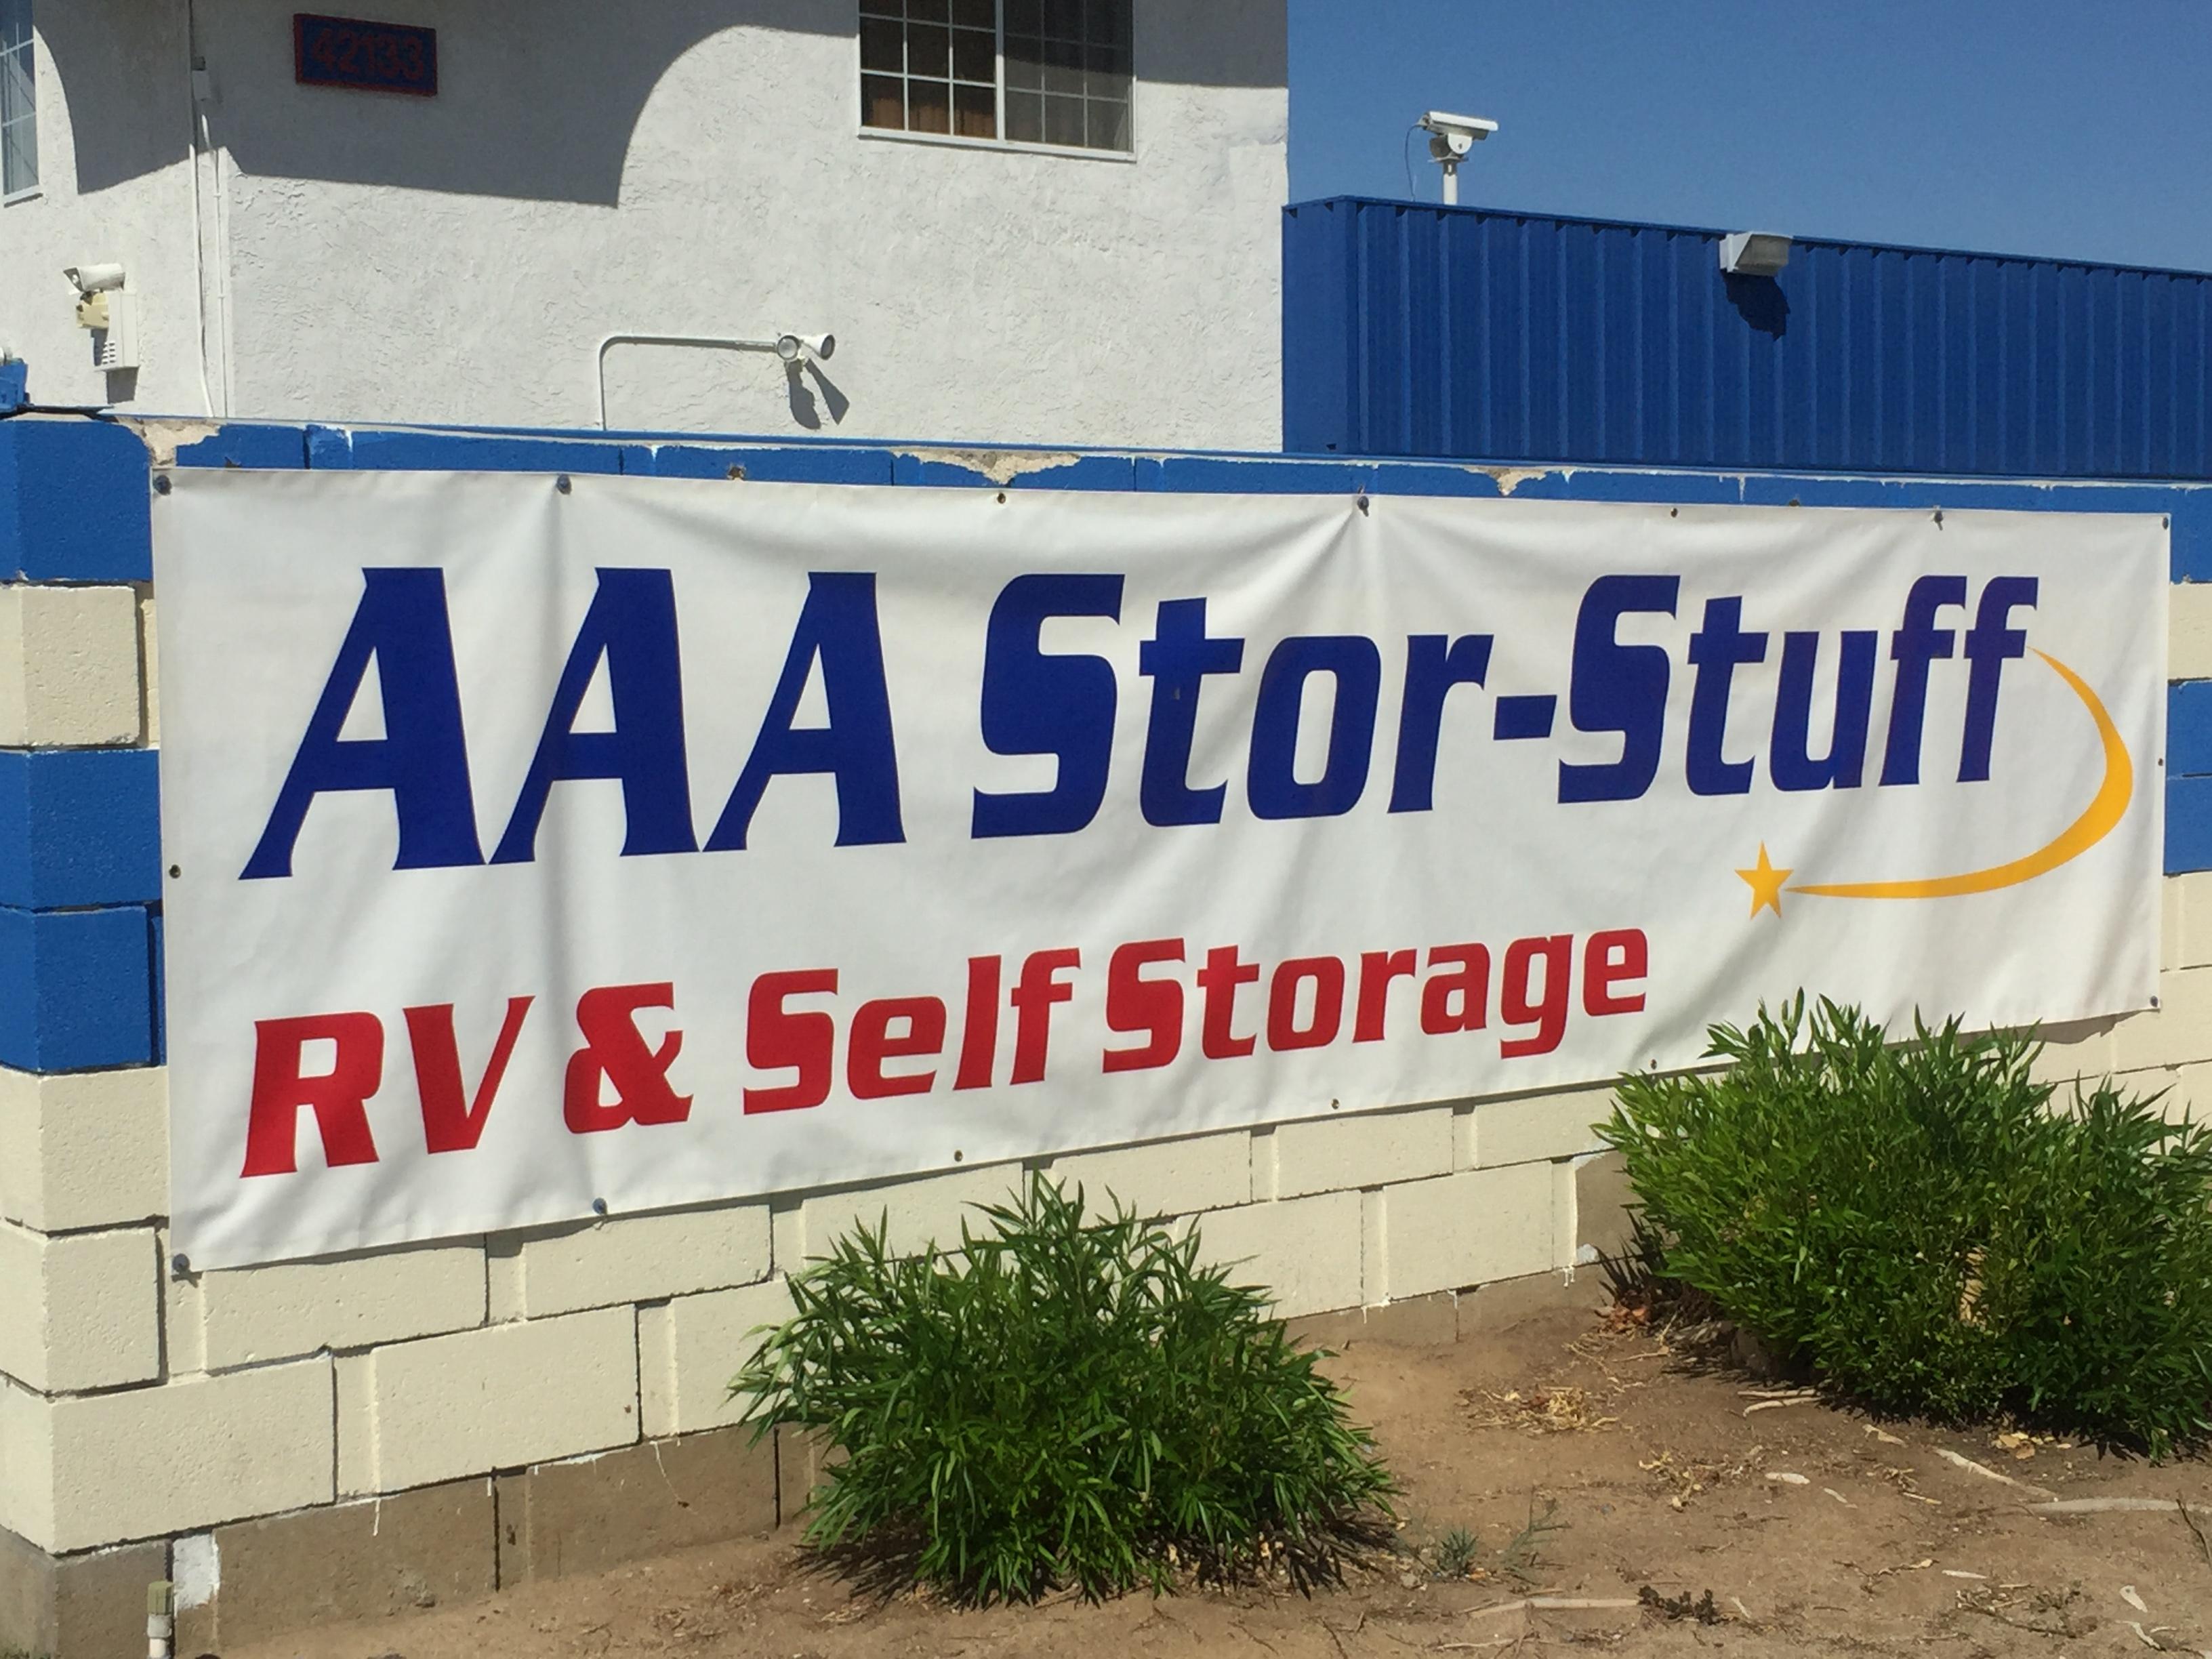 aaa stor stuff rv self storage in lancaster ca 93535. Black Bedroom Furniture Sets. Home Design Ideas